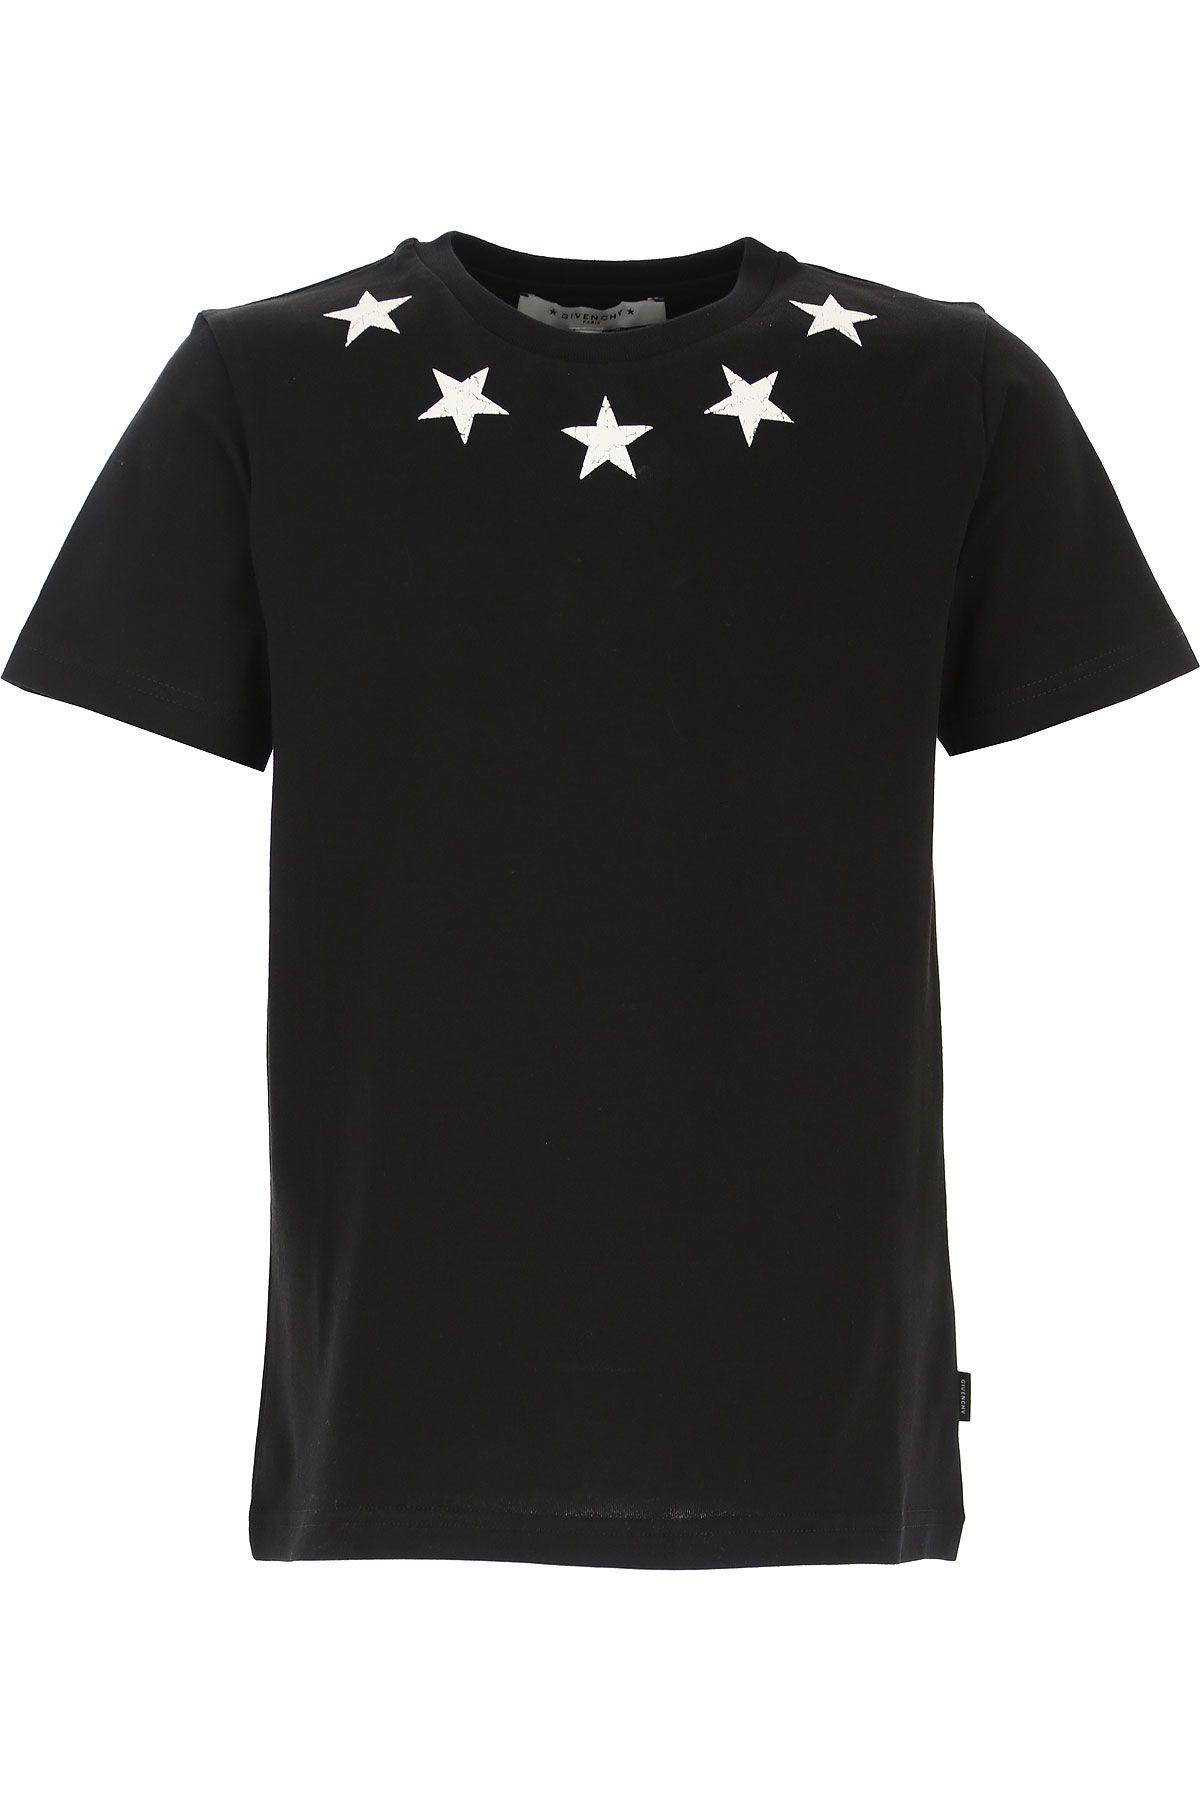 H25095 / 09B BLACK / GIVENCHY BLACK TEE W/CRACKED STARS